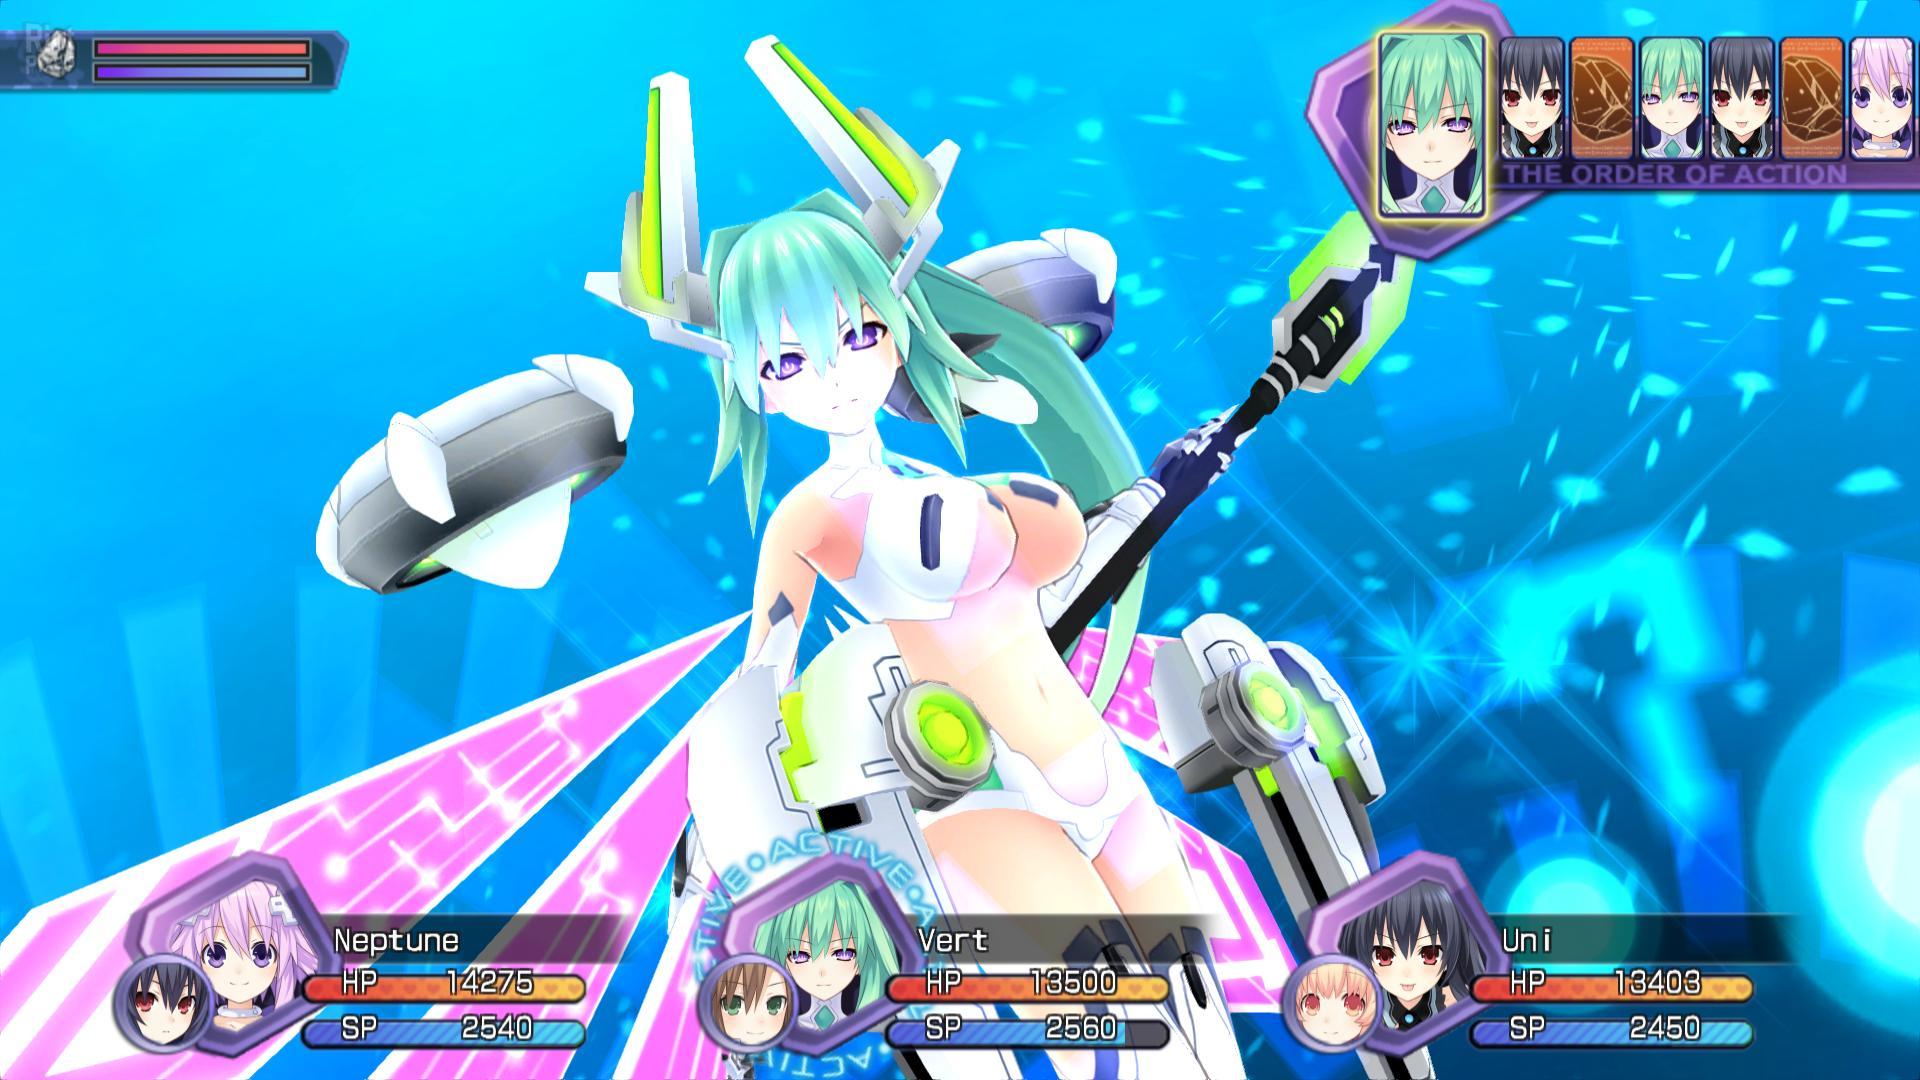 Hyperdimension Neptunia Re Birth 1 Game Screenshots At Riot